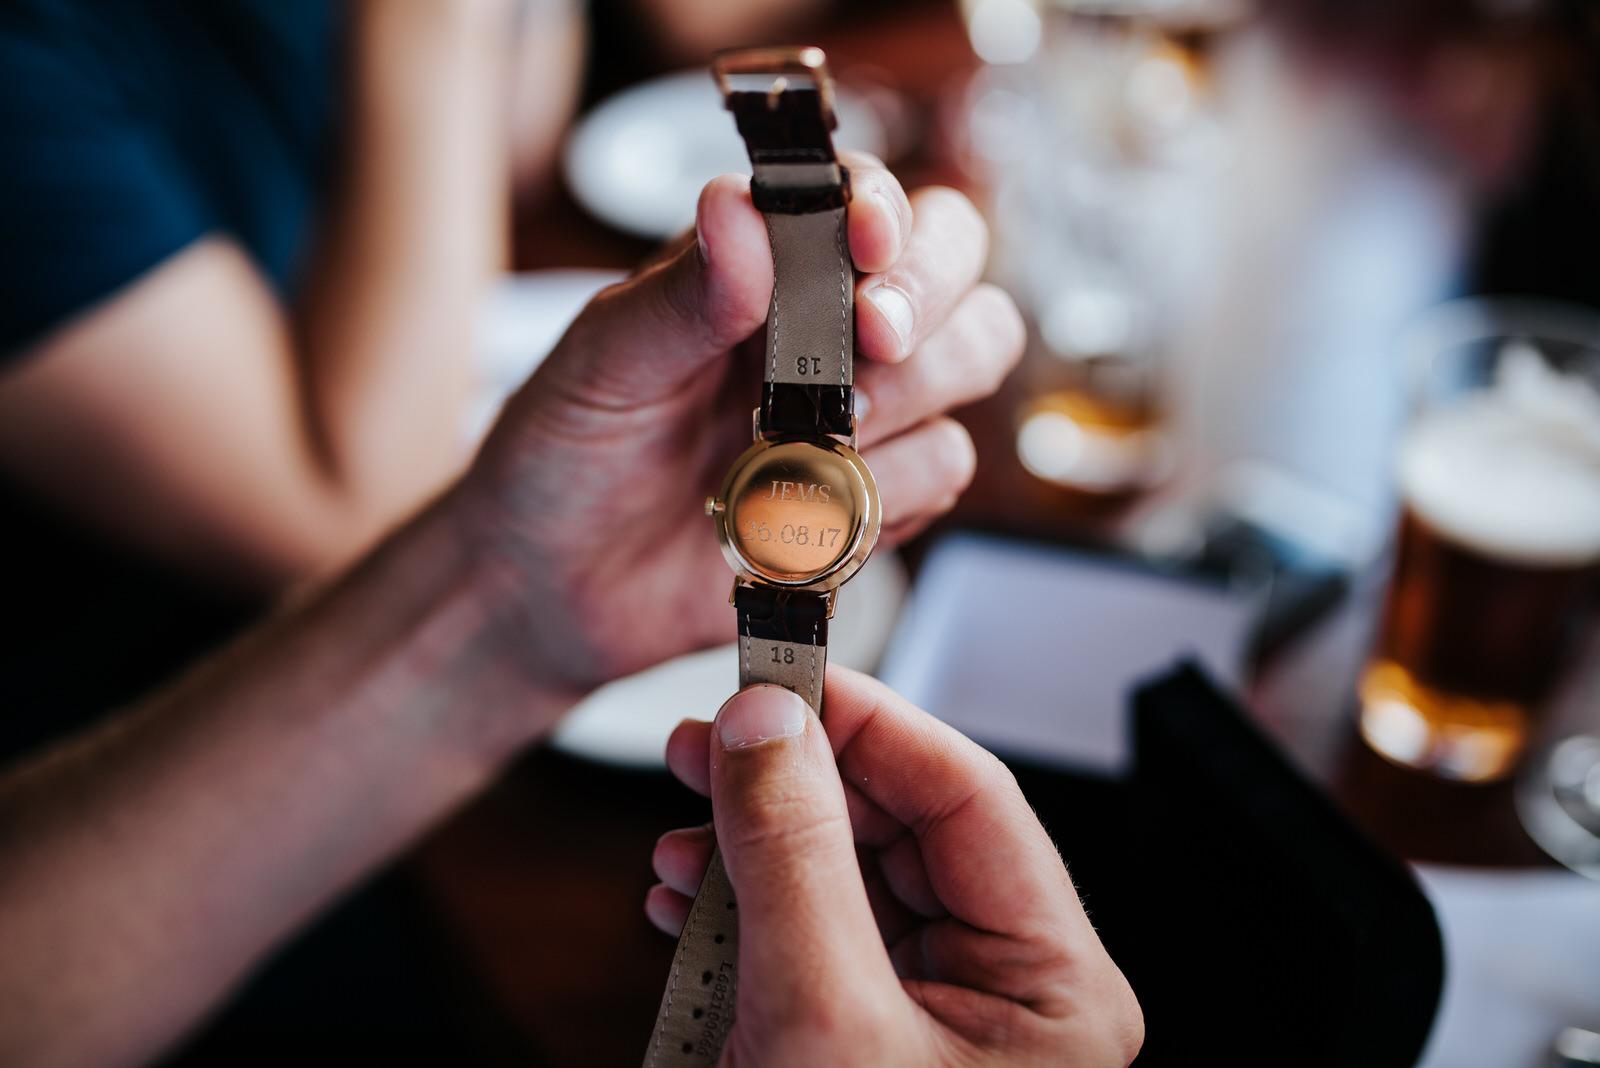 Groom looks at monogrammed watch bride gifted him